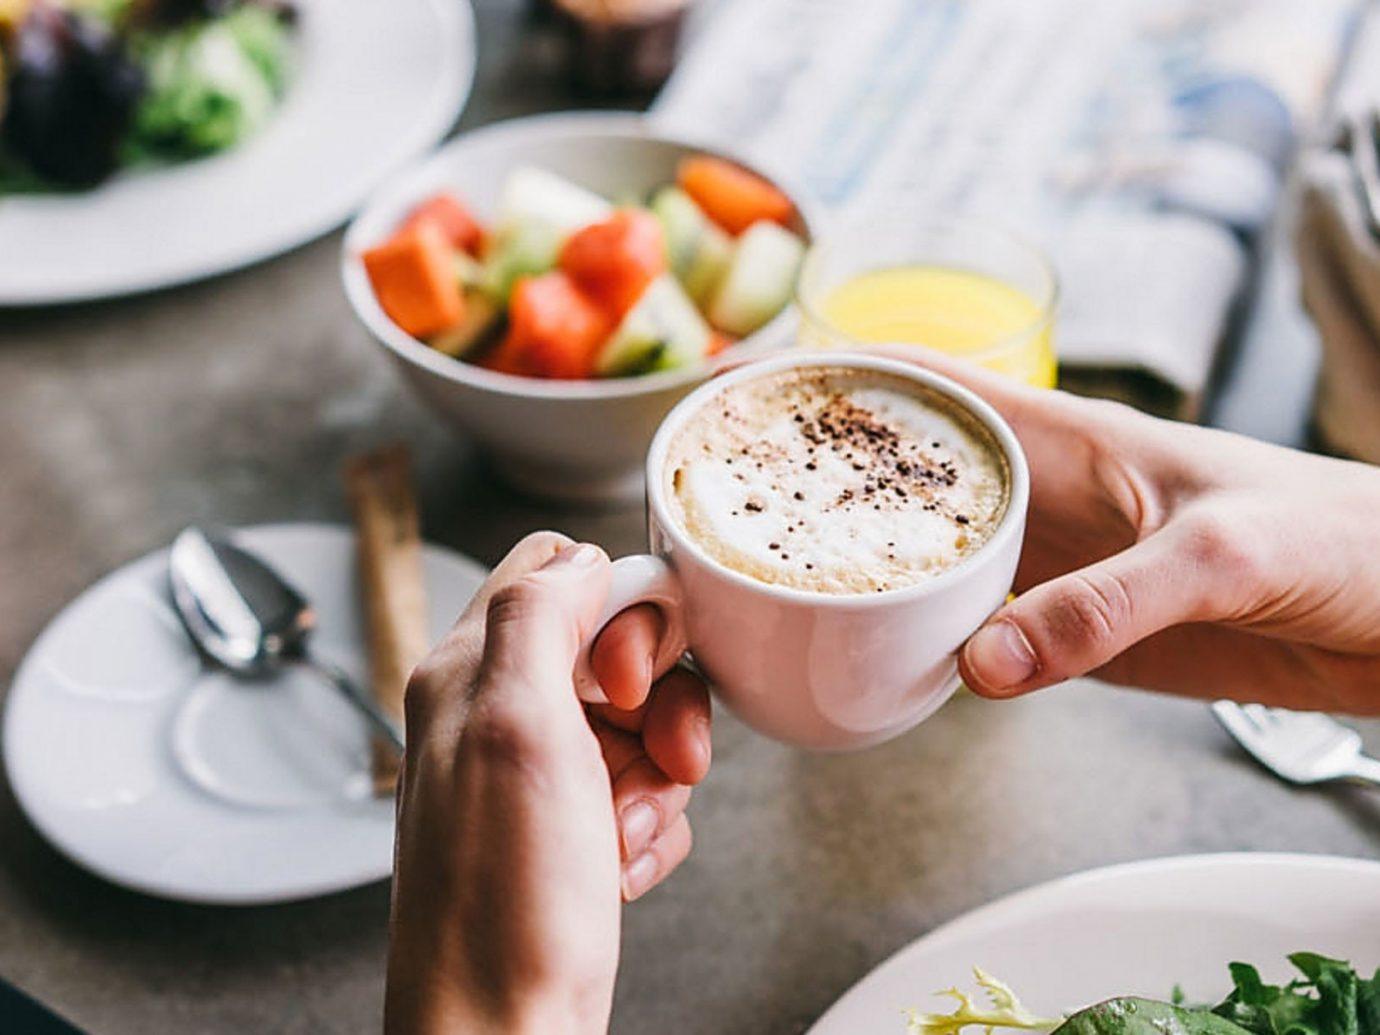 Hotels plate food table person meal lunch dish brunch breakfast produce sense dinner taste